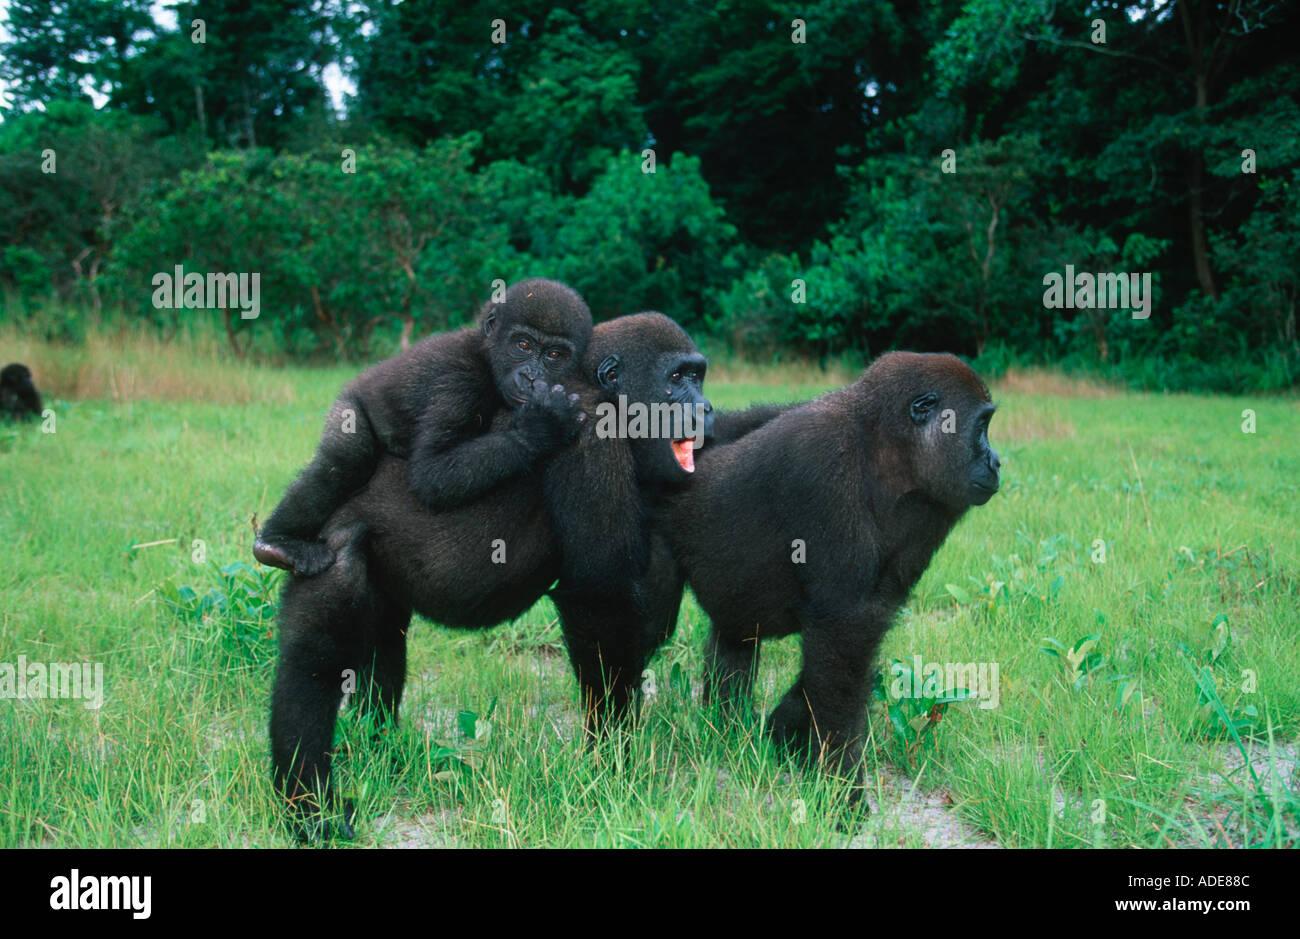 Western Lowland Gorilla Orphaned gorillas reintroduced into the wild Projet Protection des Gorilles Gabon Congo - Stock Image